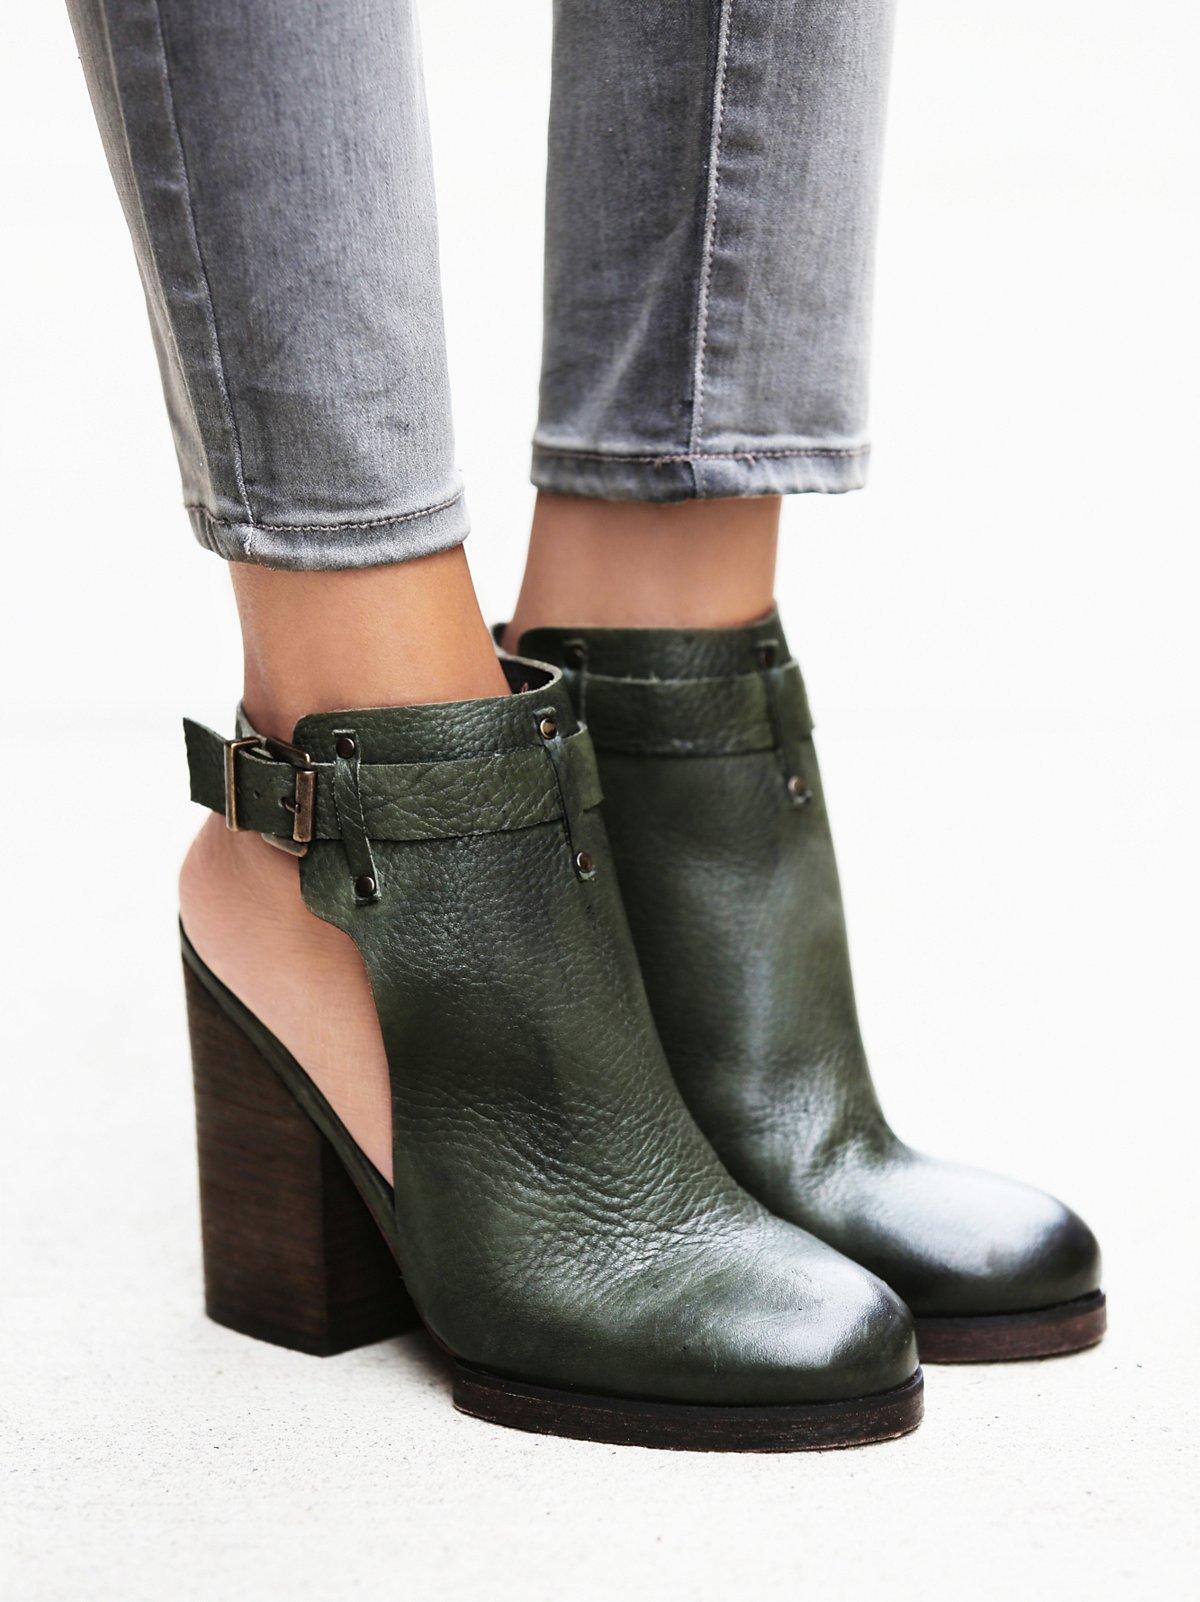 Breton高跟靴